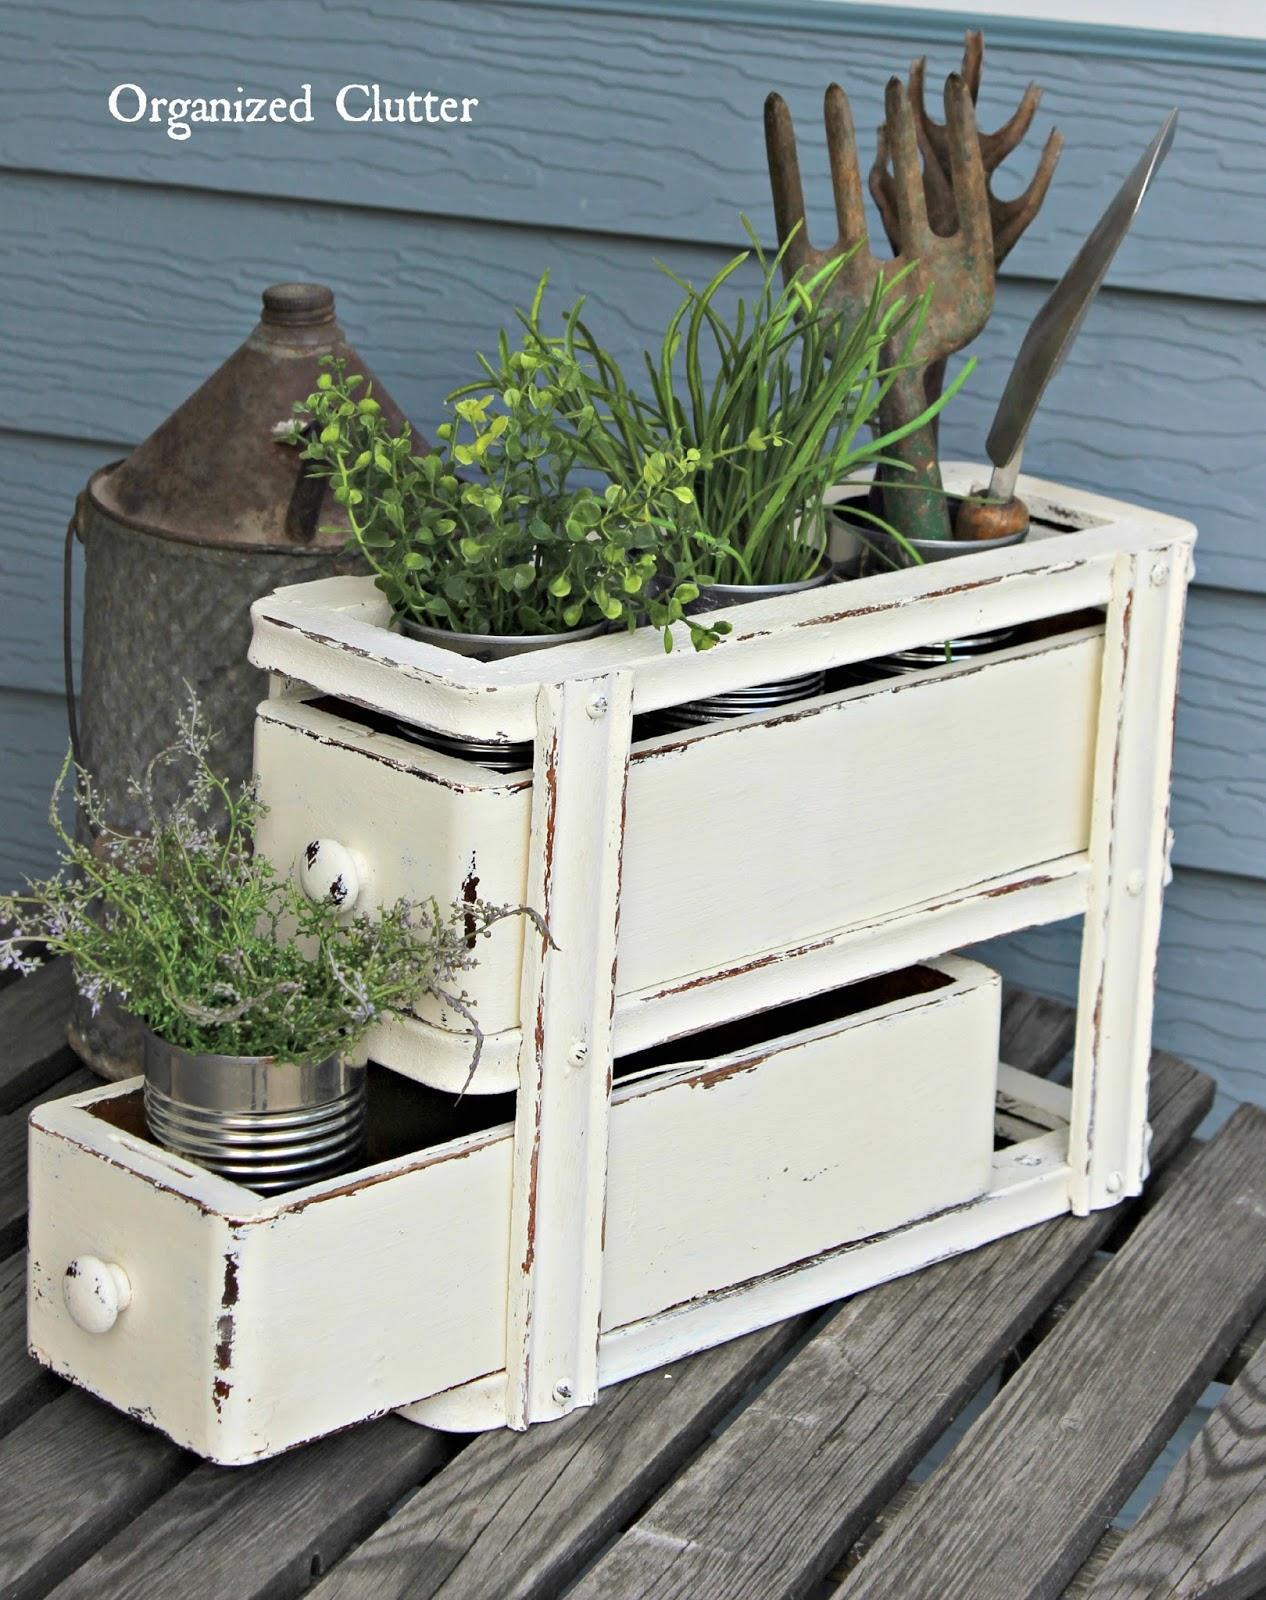 Repurposed Sewing Machine Drawer Flower Holder www.organizedclutter.net